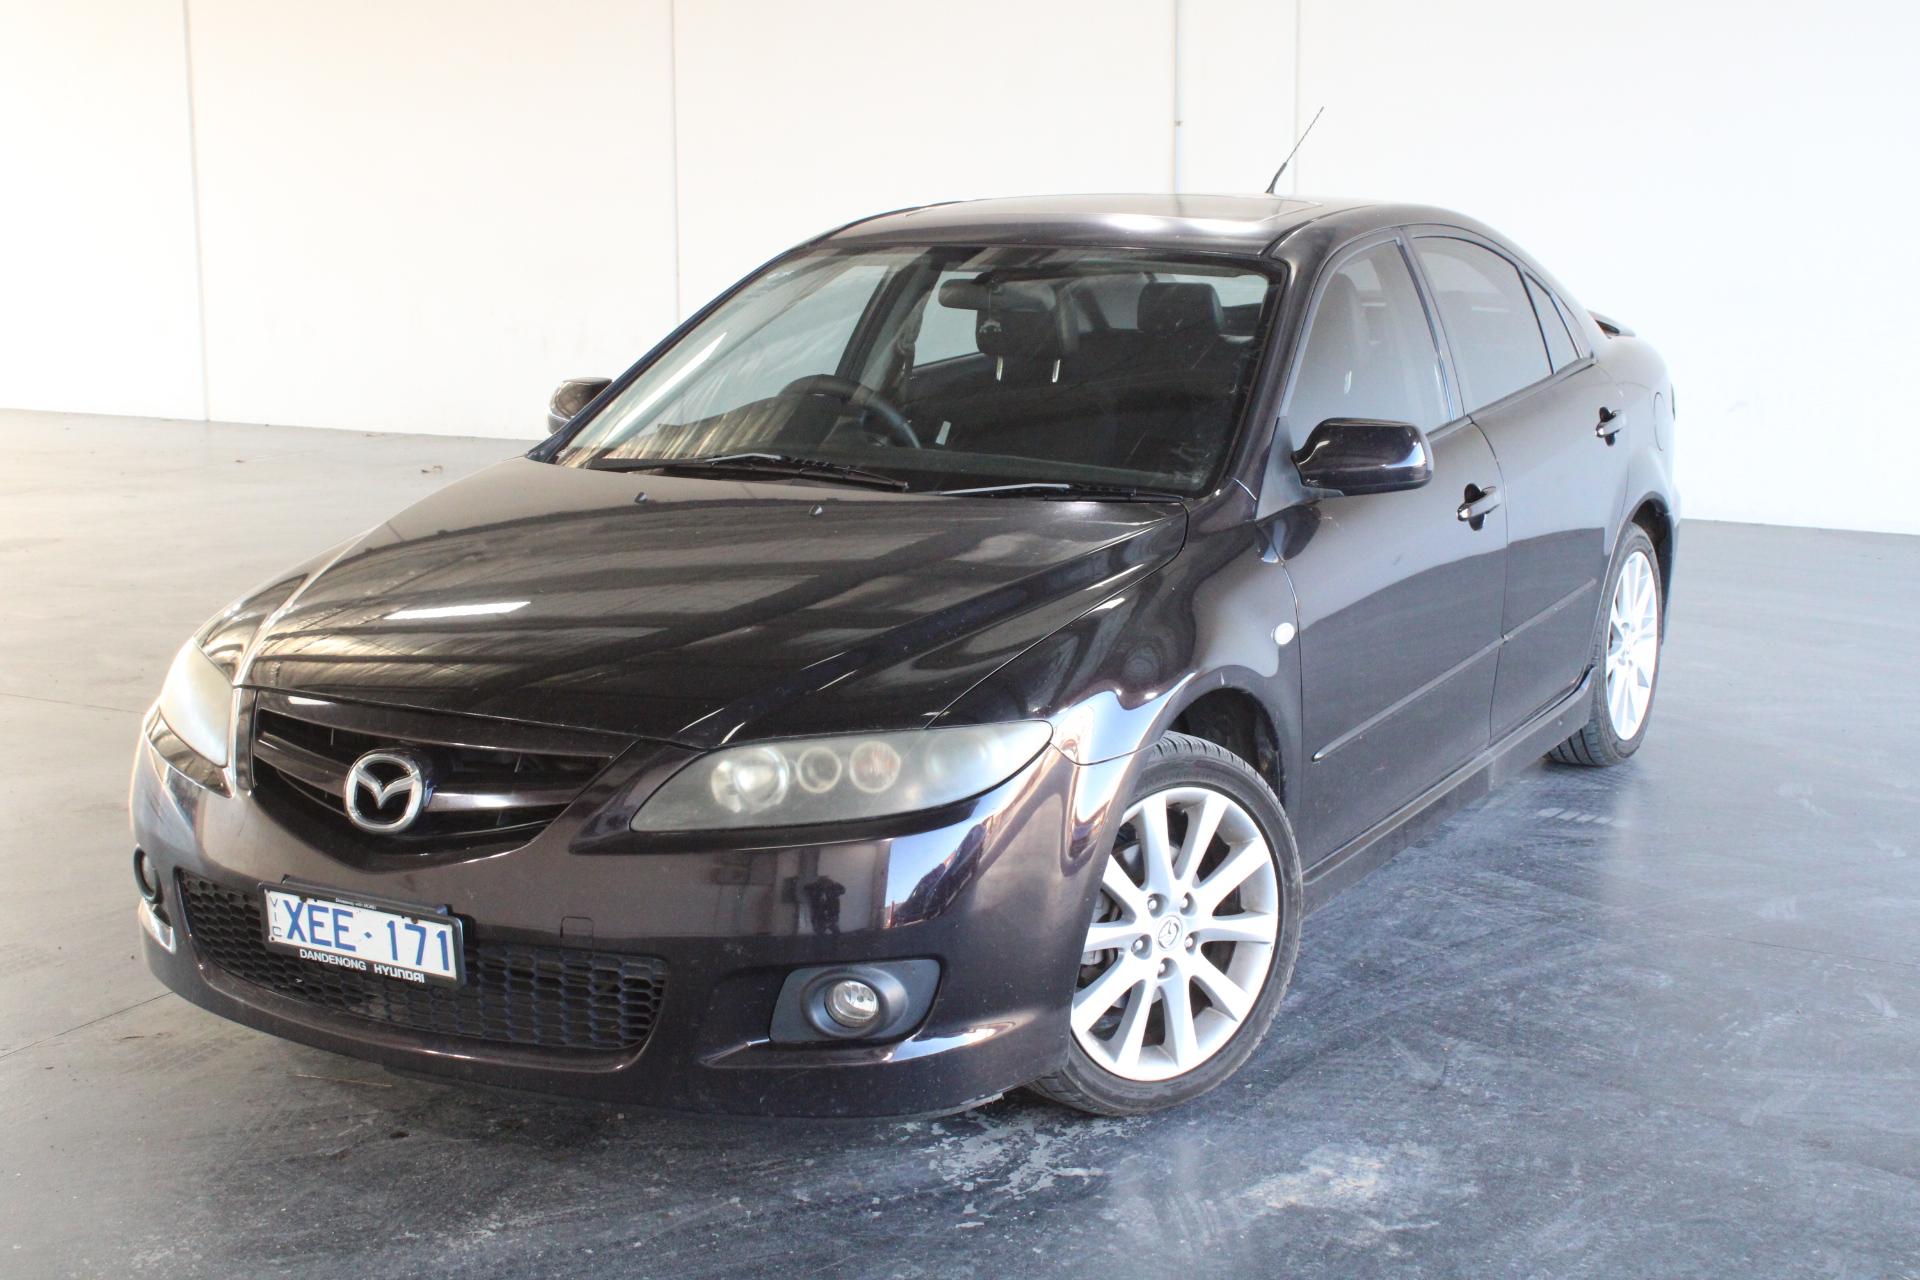 2006 Mazda 6 Luxury Sports GG Automatic Hatchback